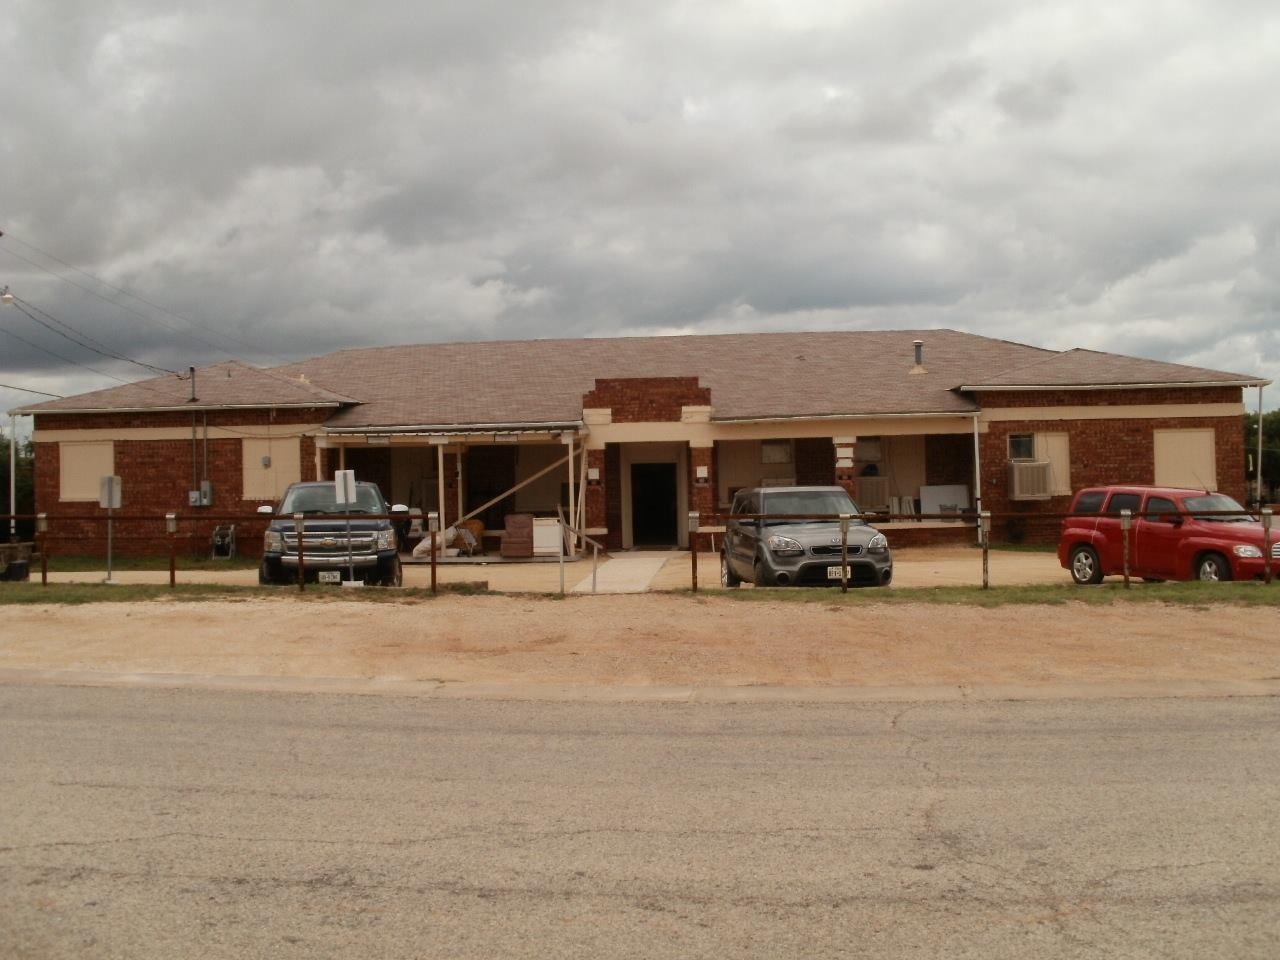 Community Mission of Colorado City